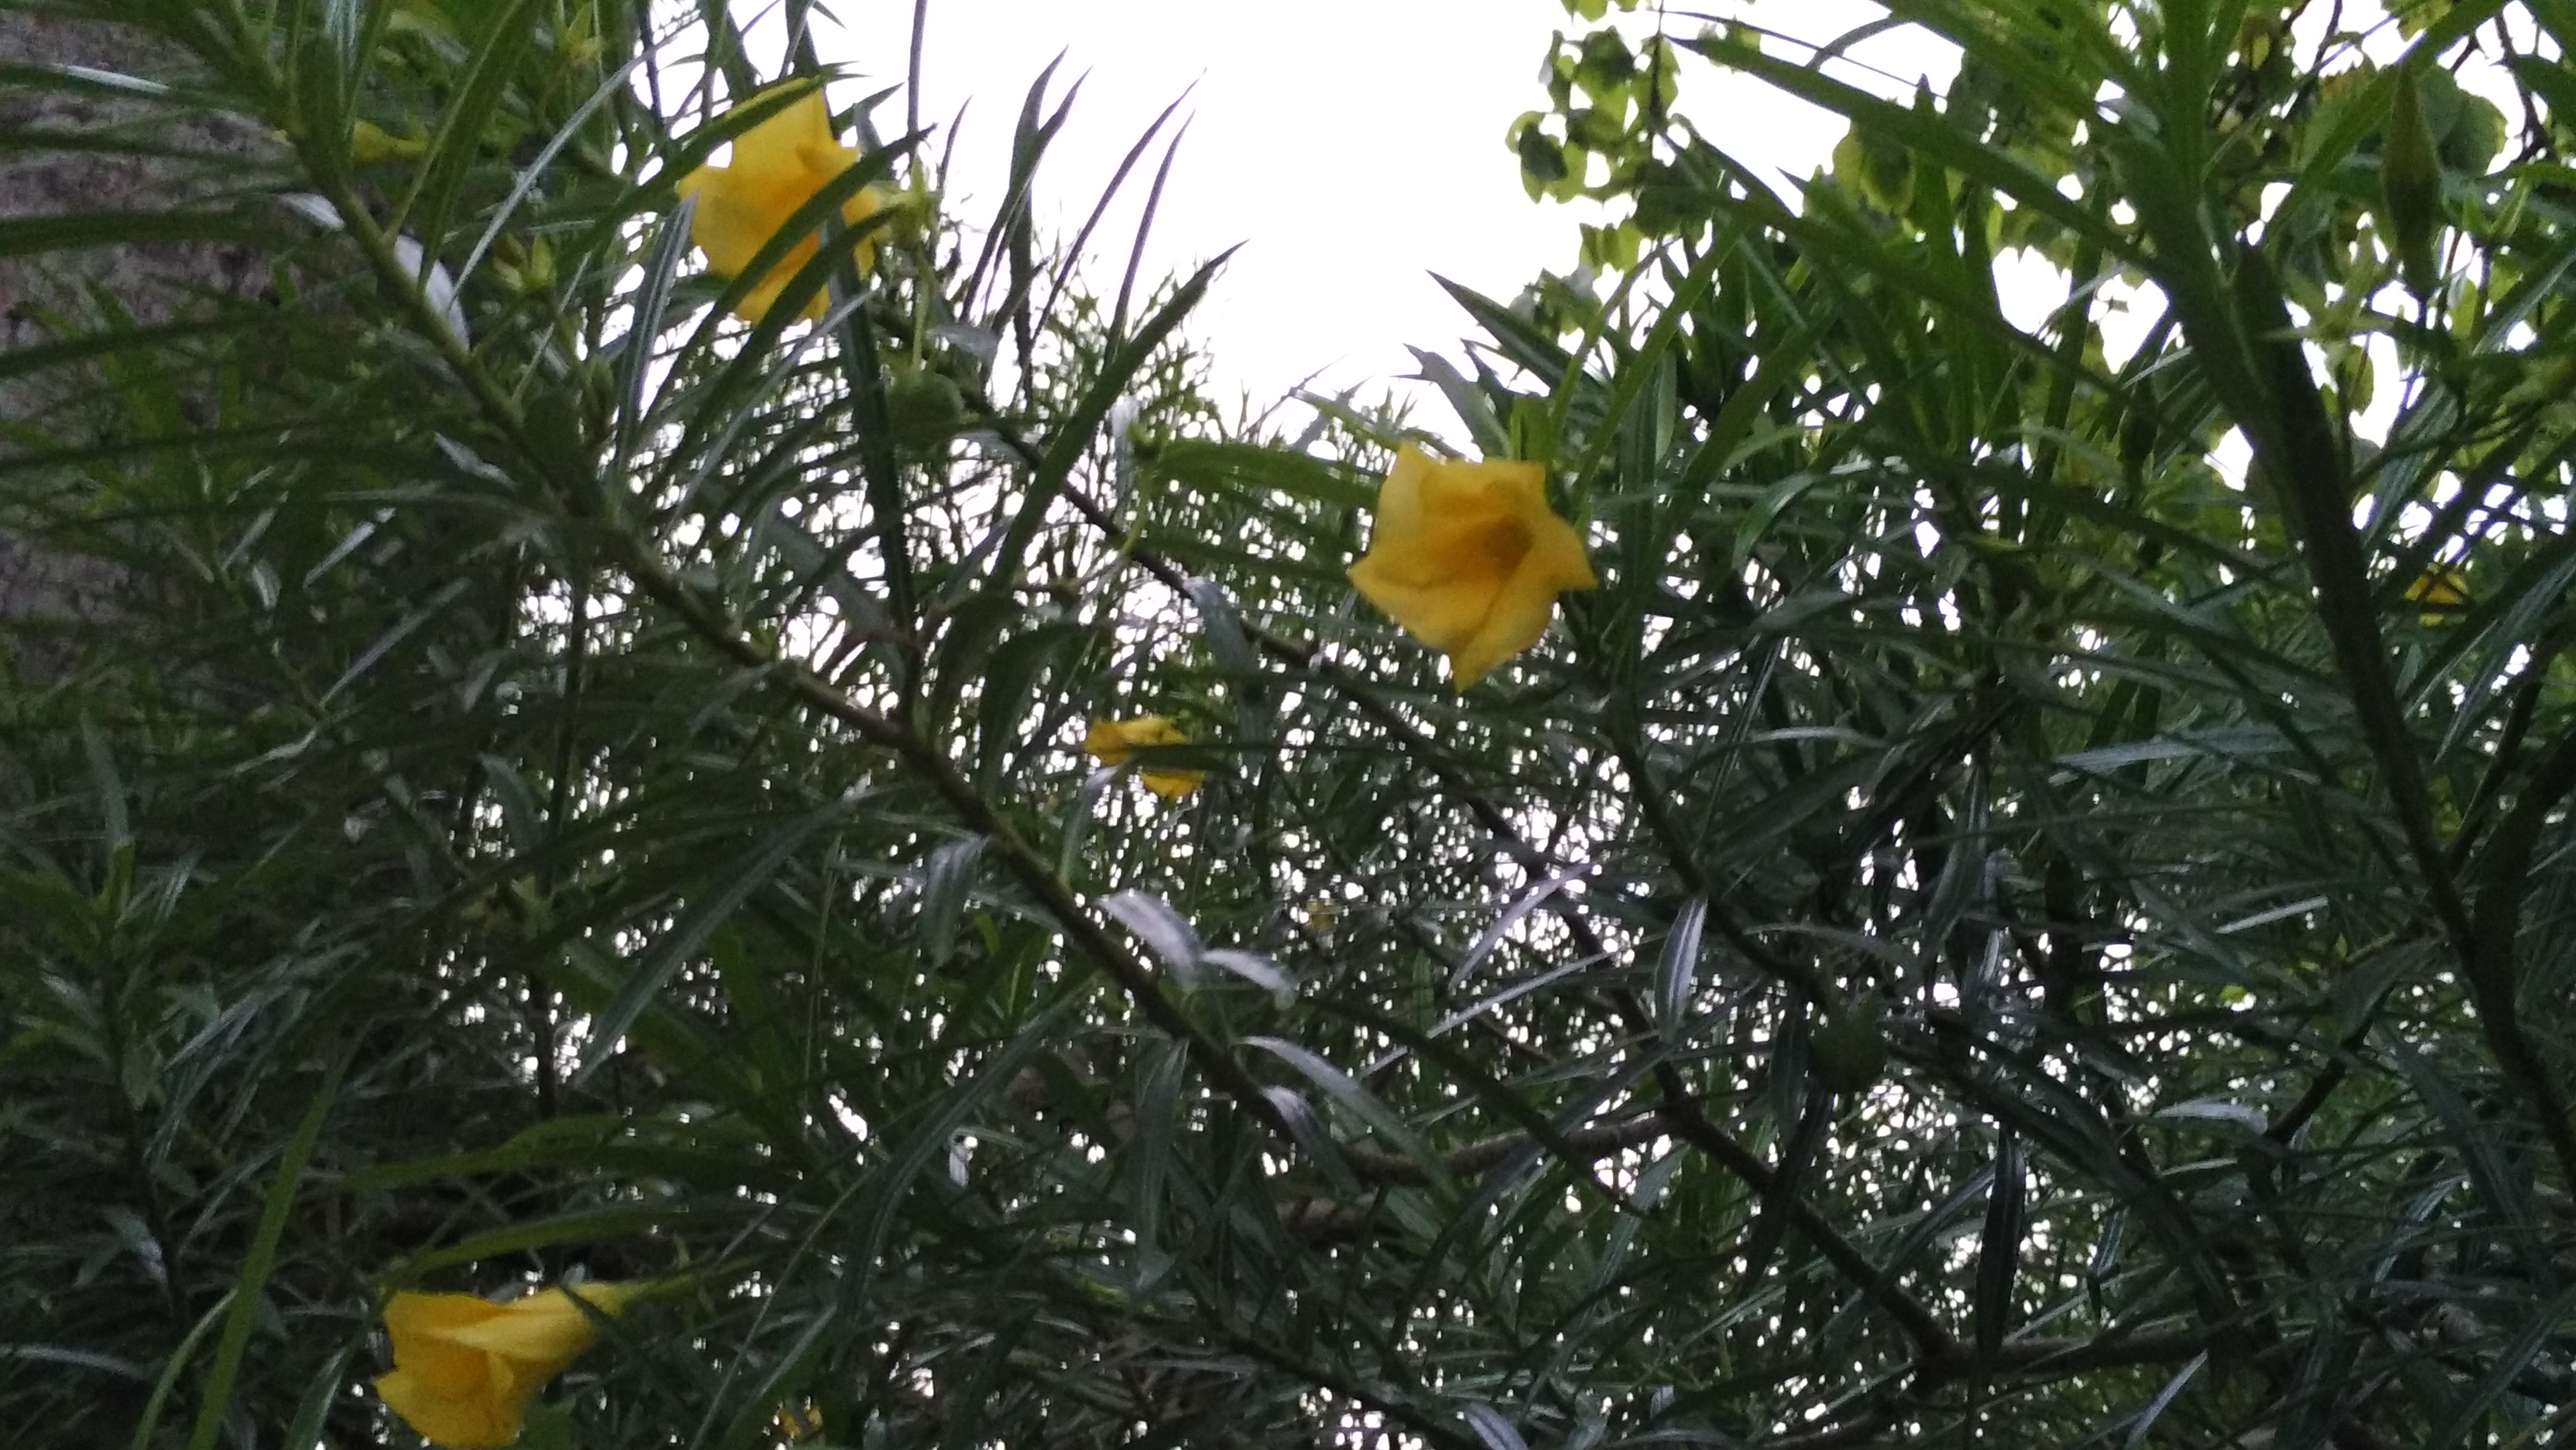 Filekaner Flower In A Parkg Wikimedia Commons